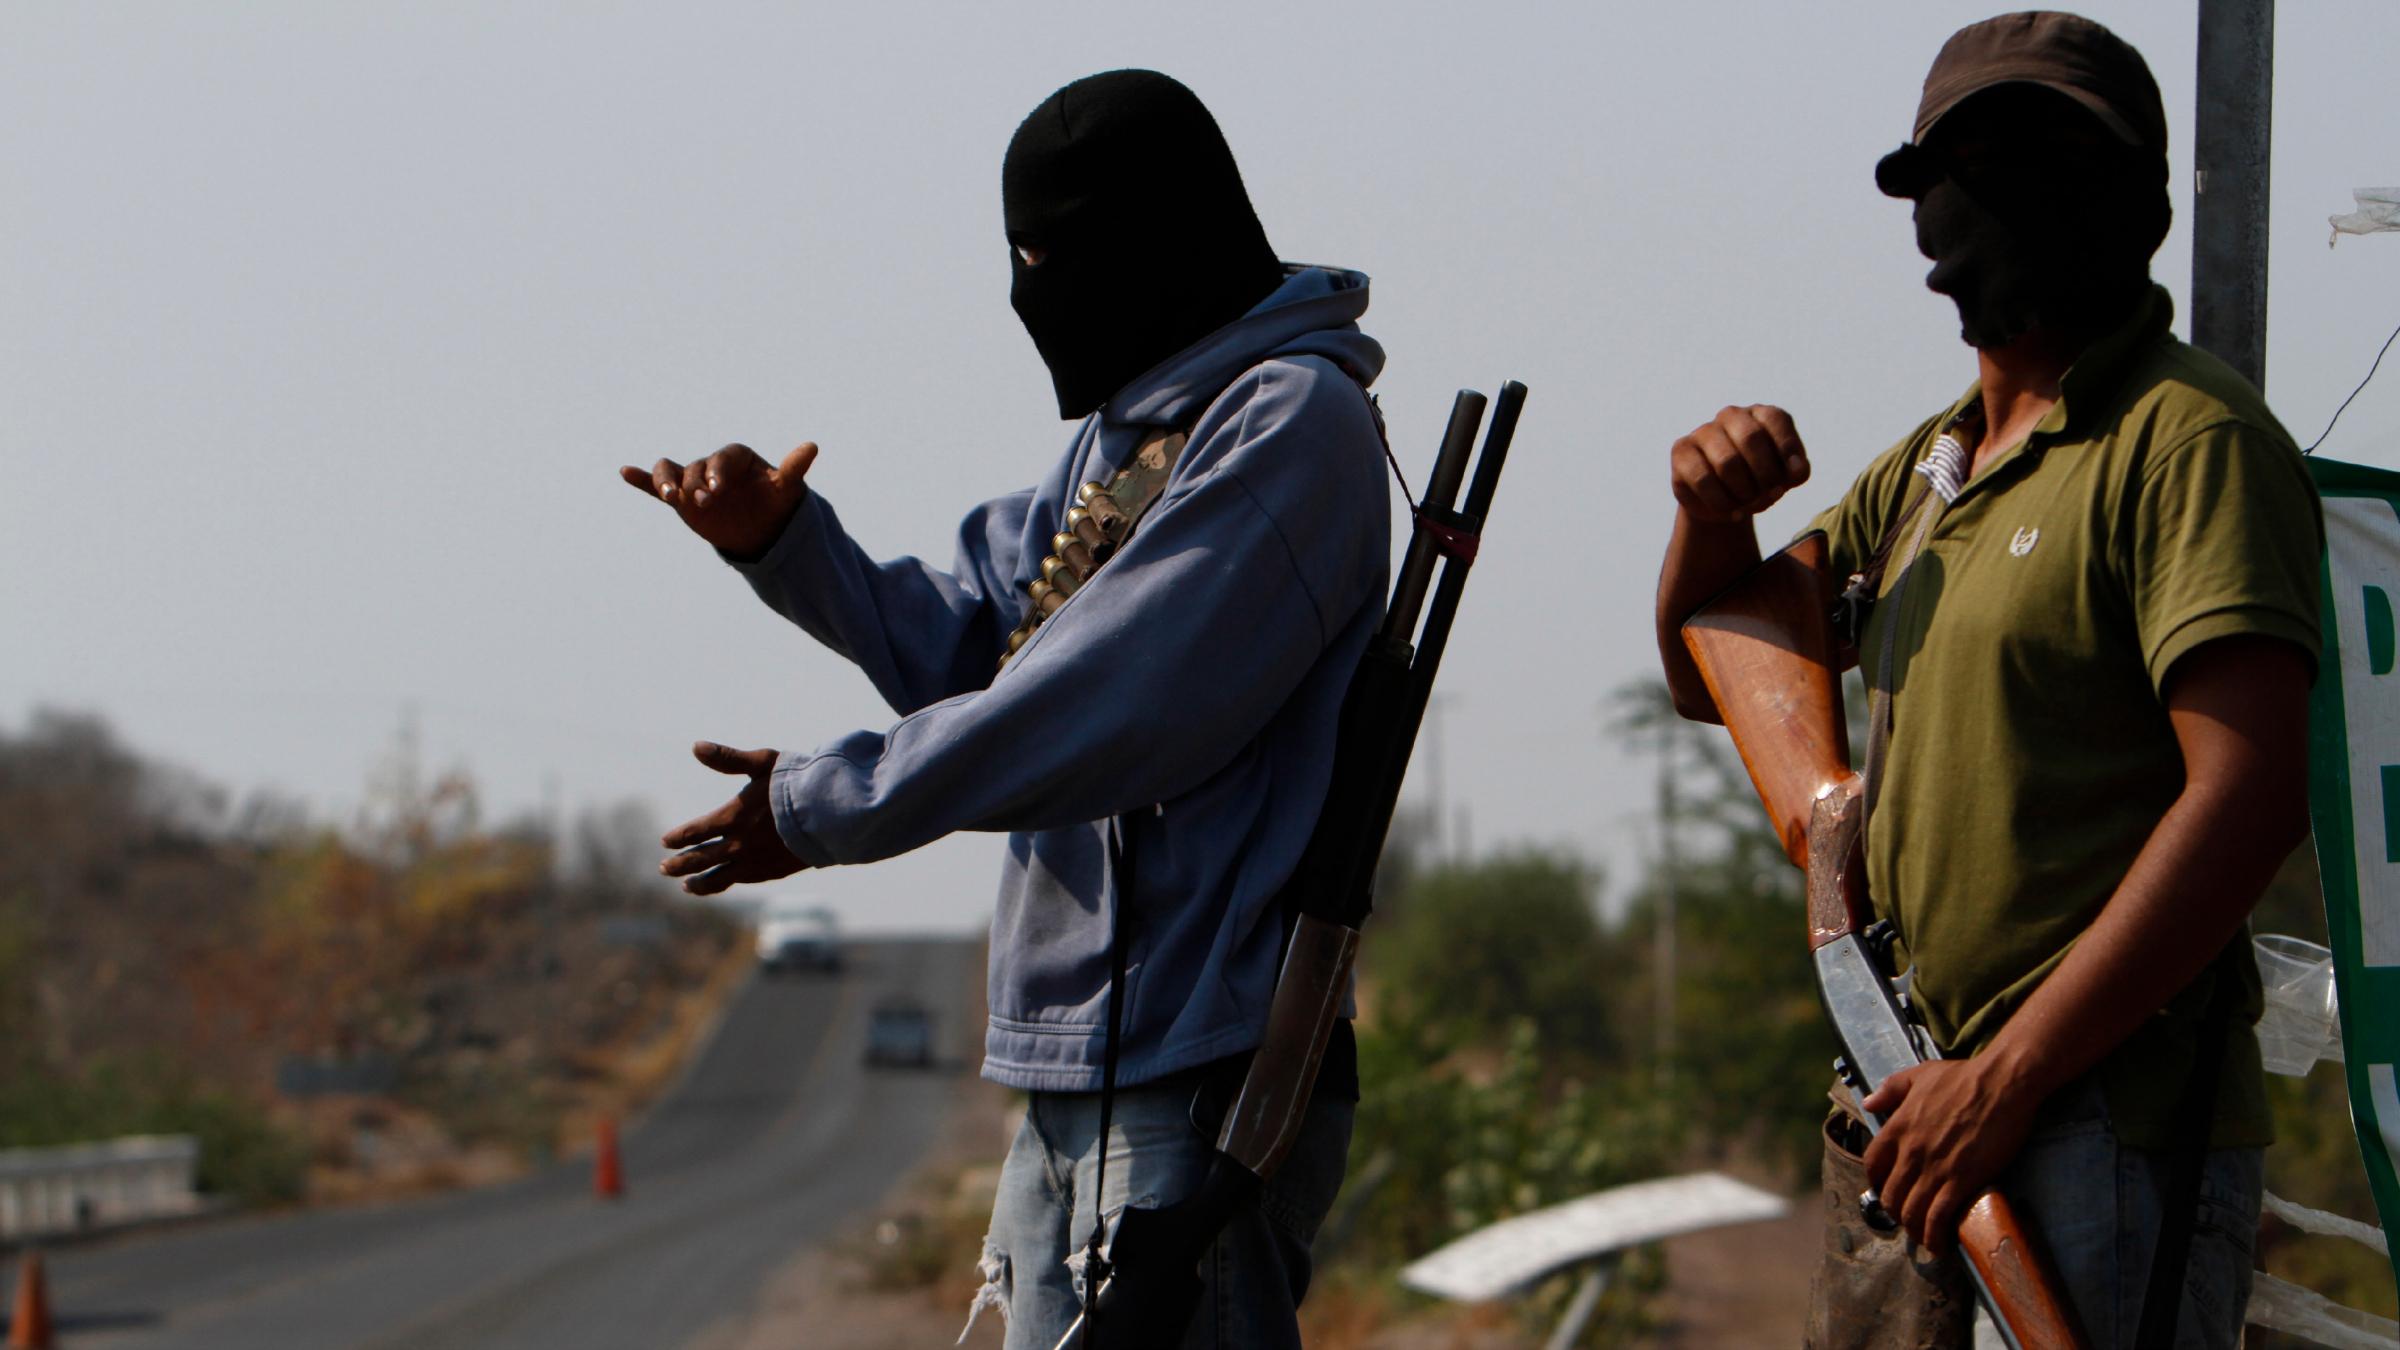 Masked and armed drug cartel members